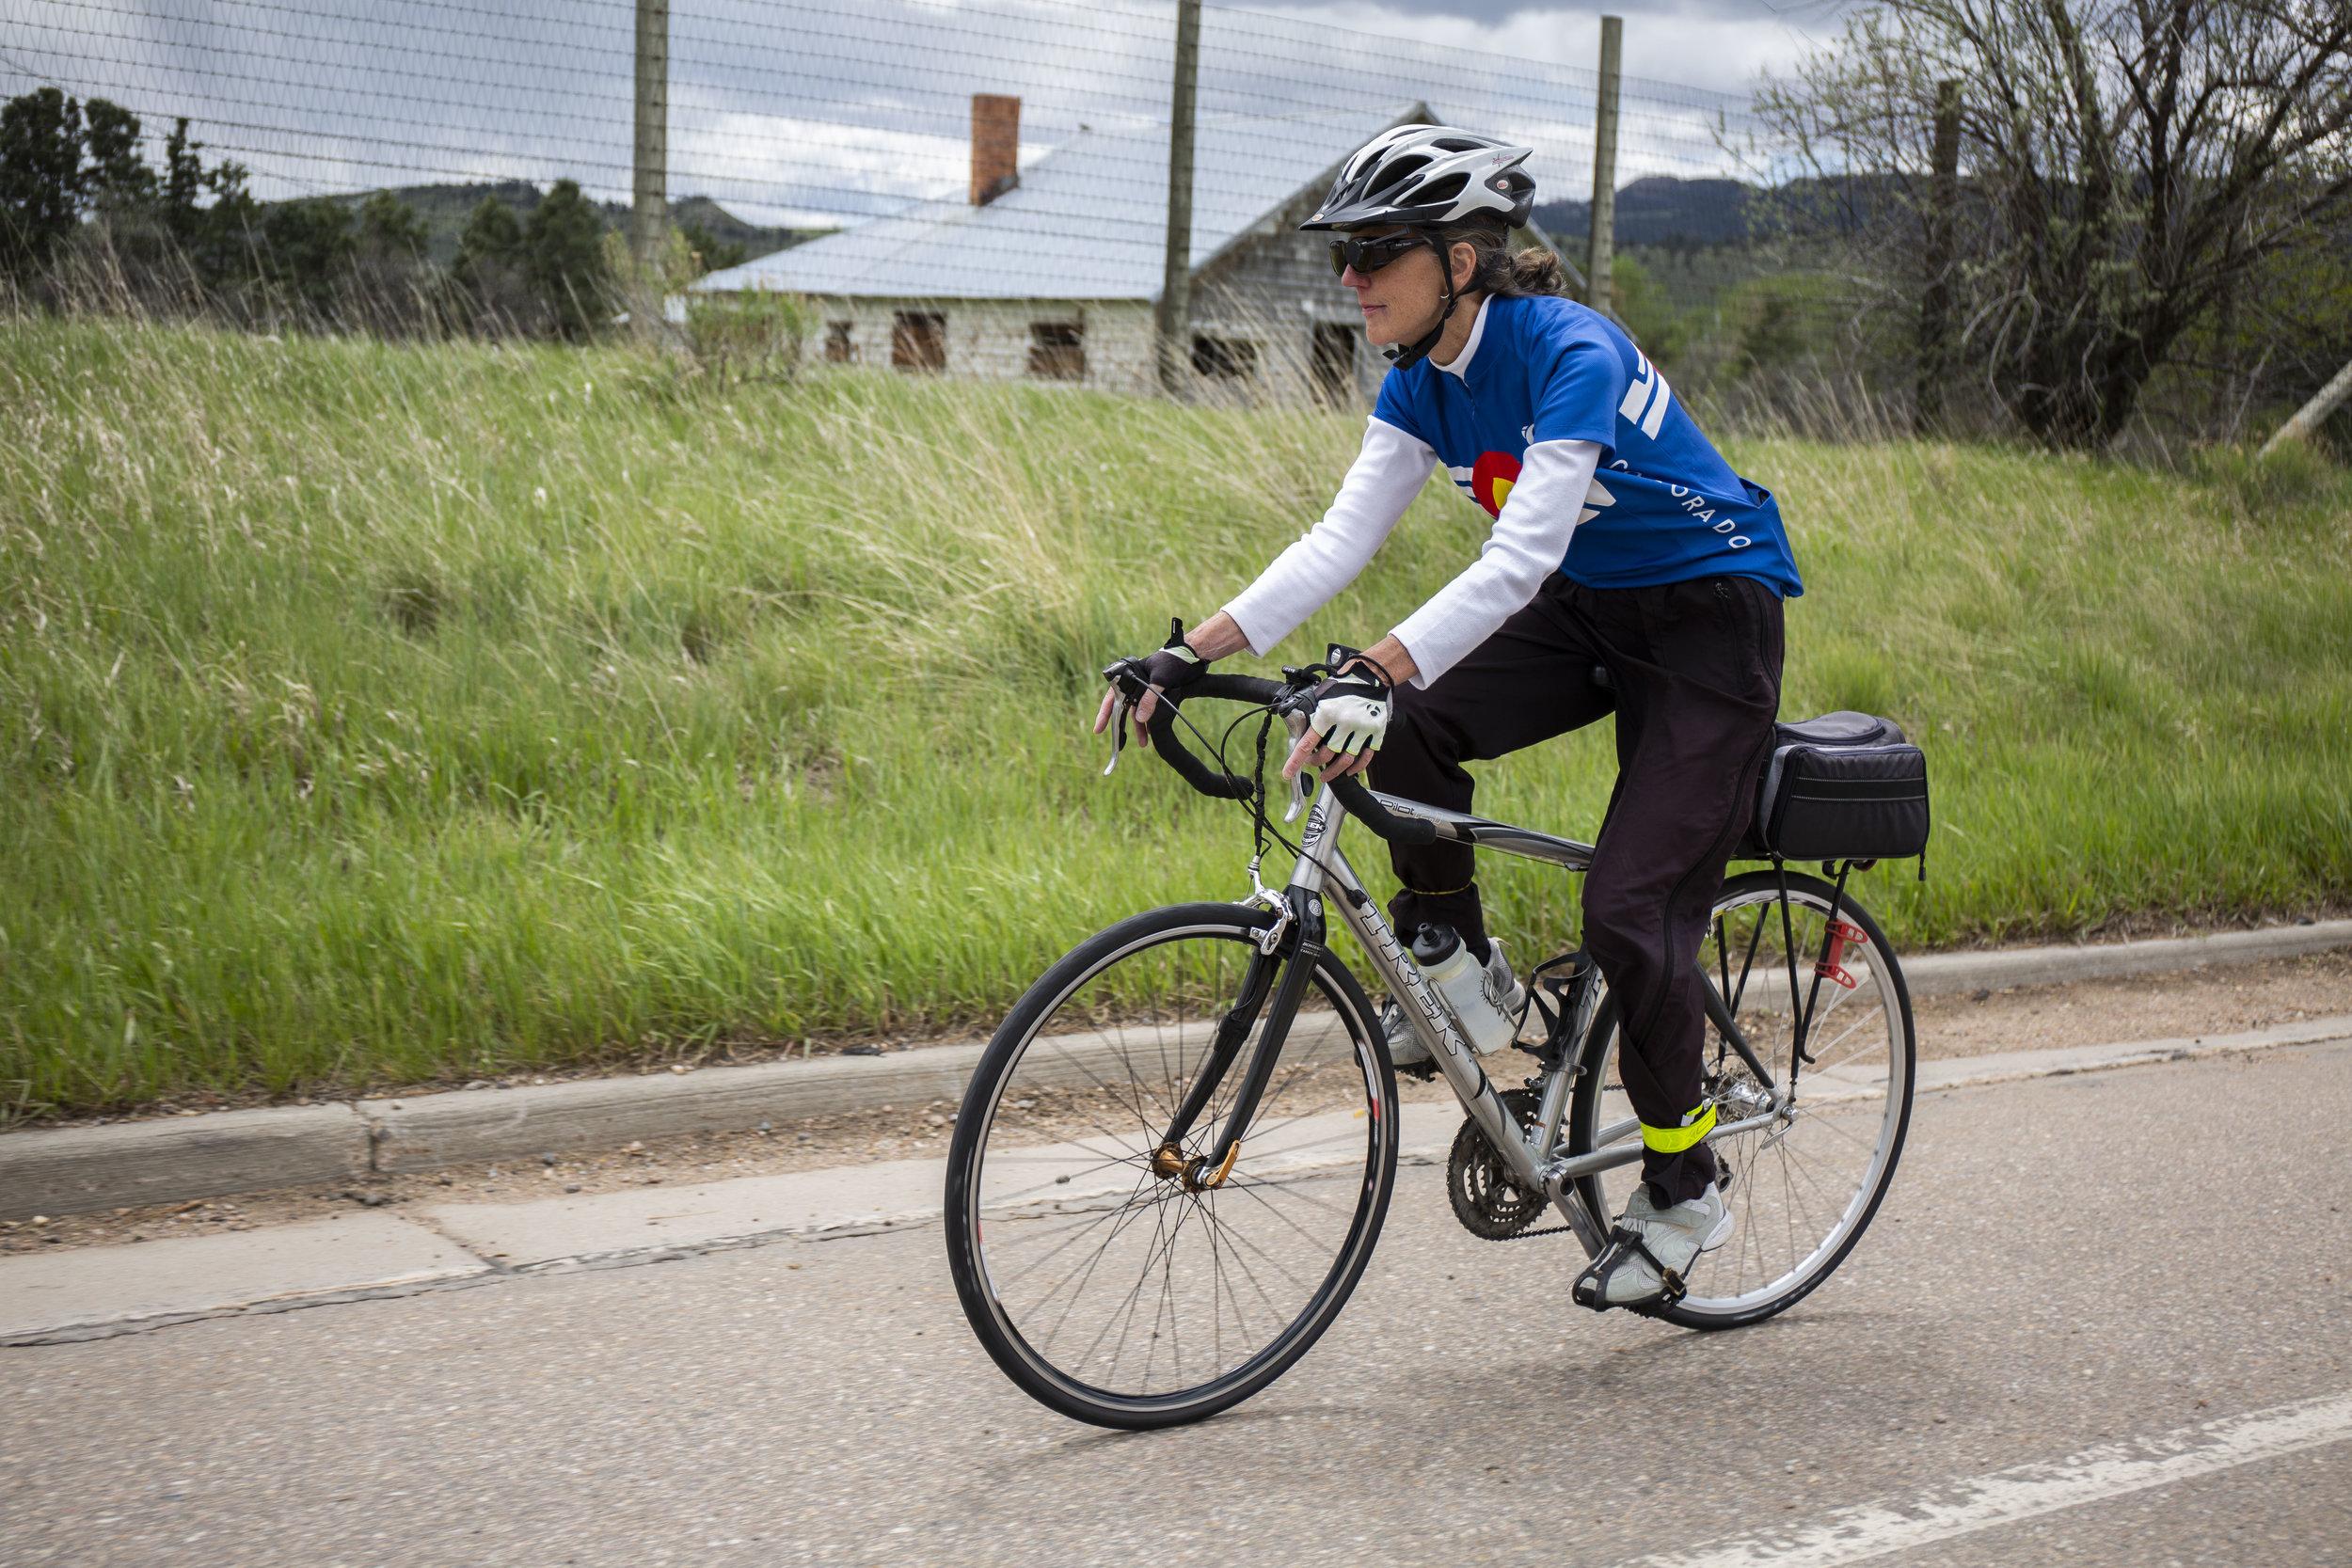 SN_HM_001_Kathy_Bike.JPG